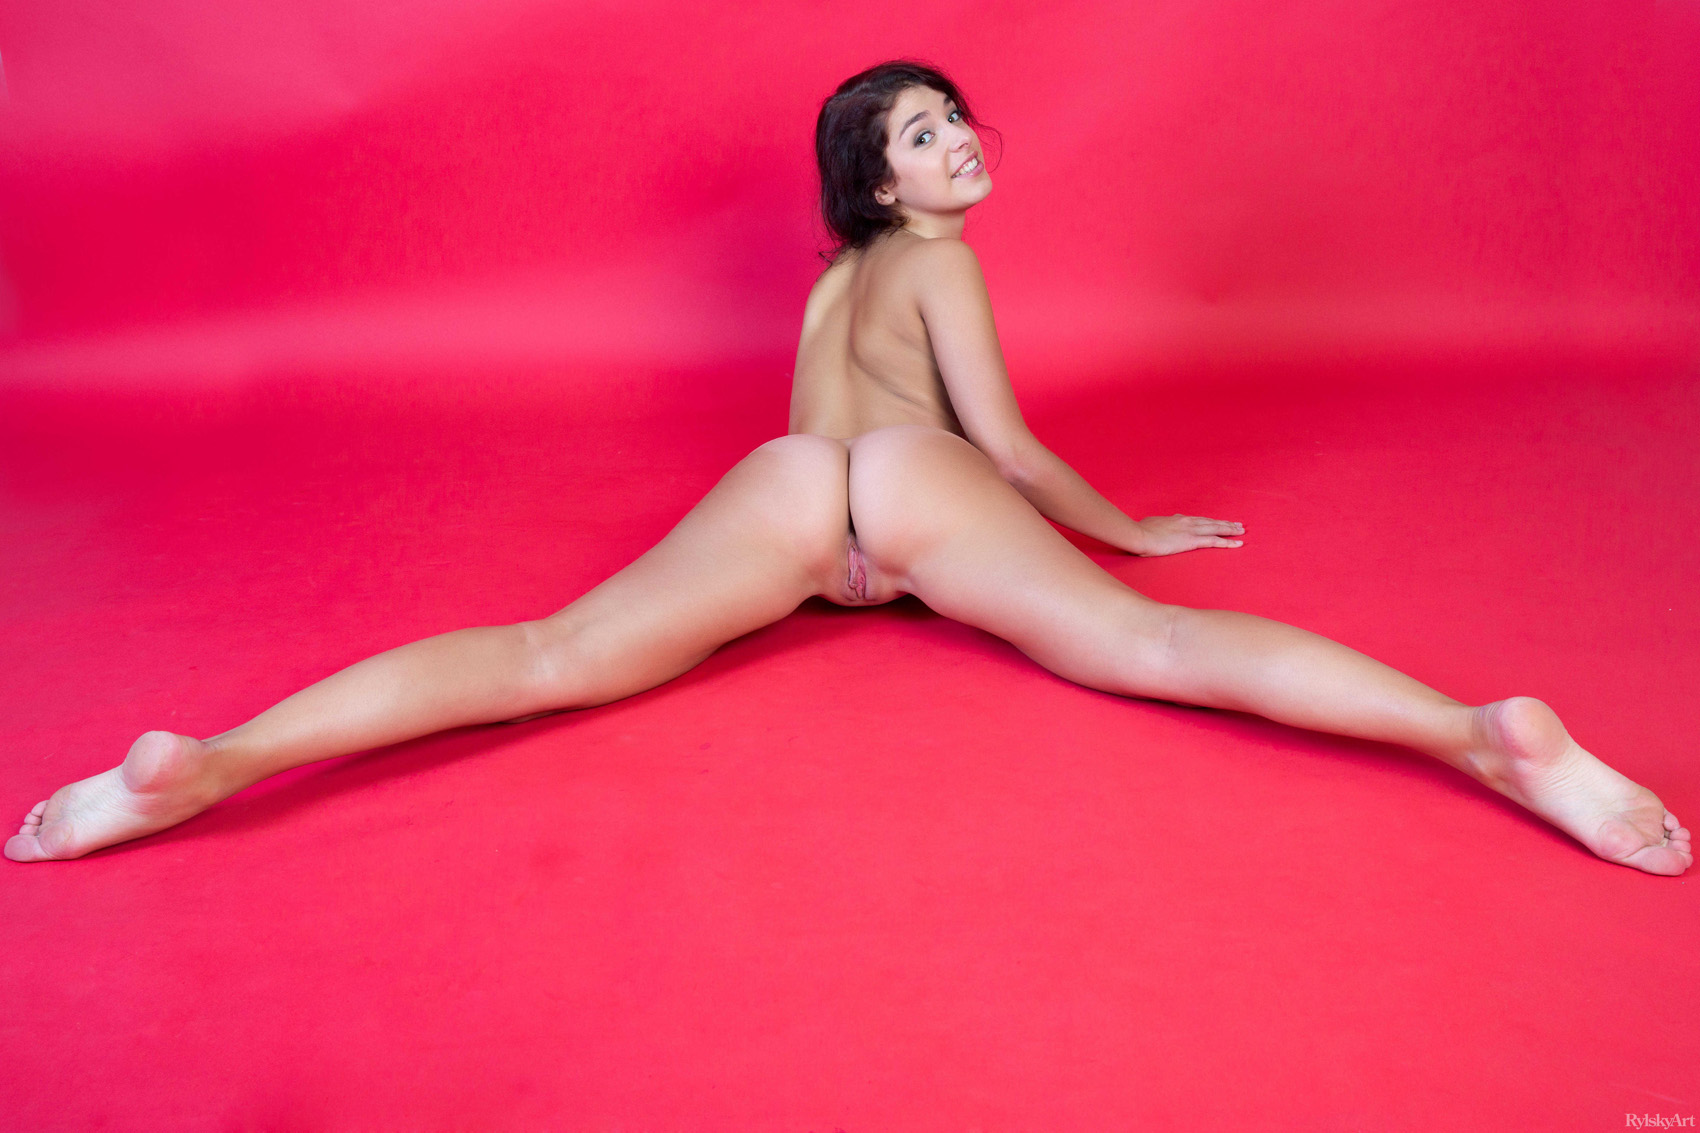 Model evita lima nude